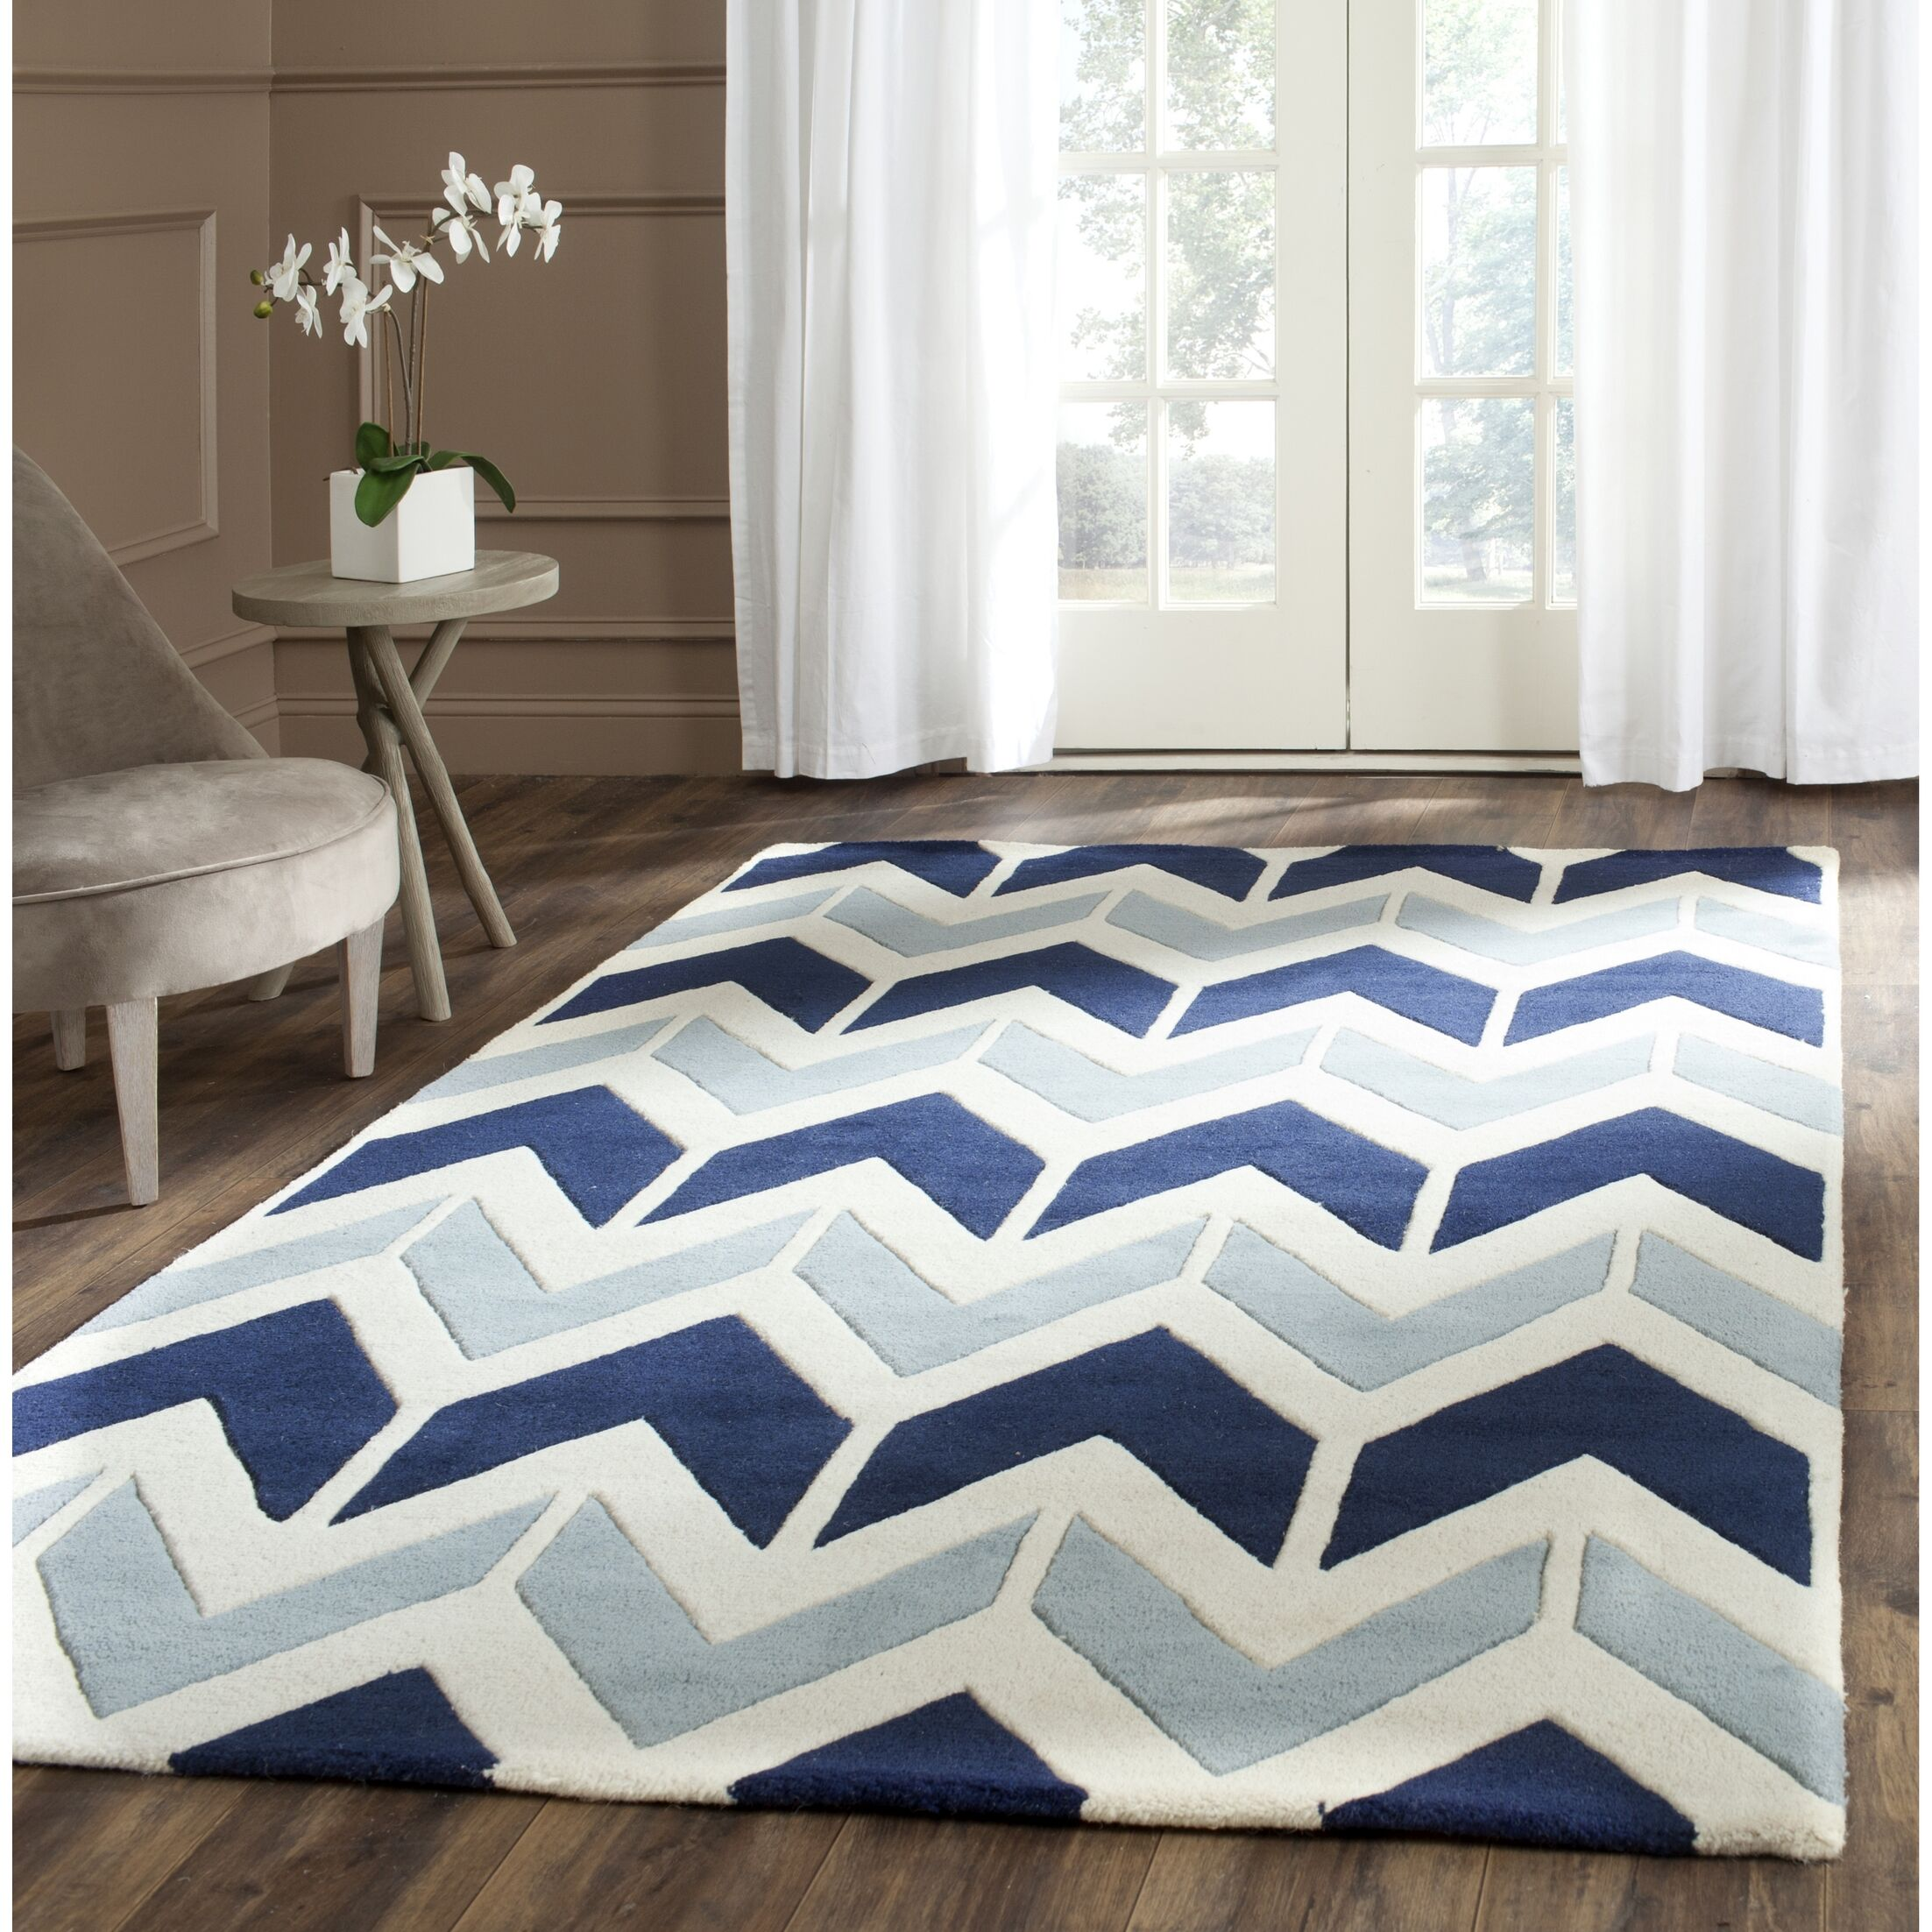 Wilkin Dark Blue / Light Blue Area Rug Rug Size: Rectangle 3' x 5'